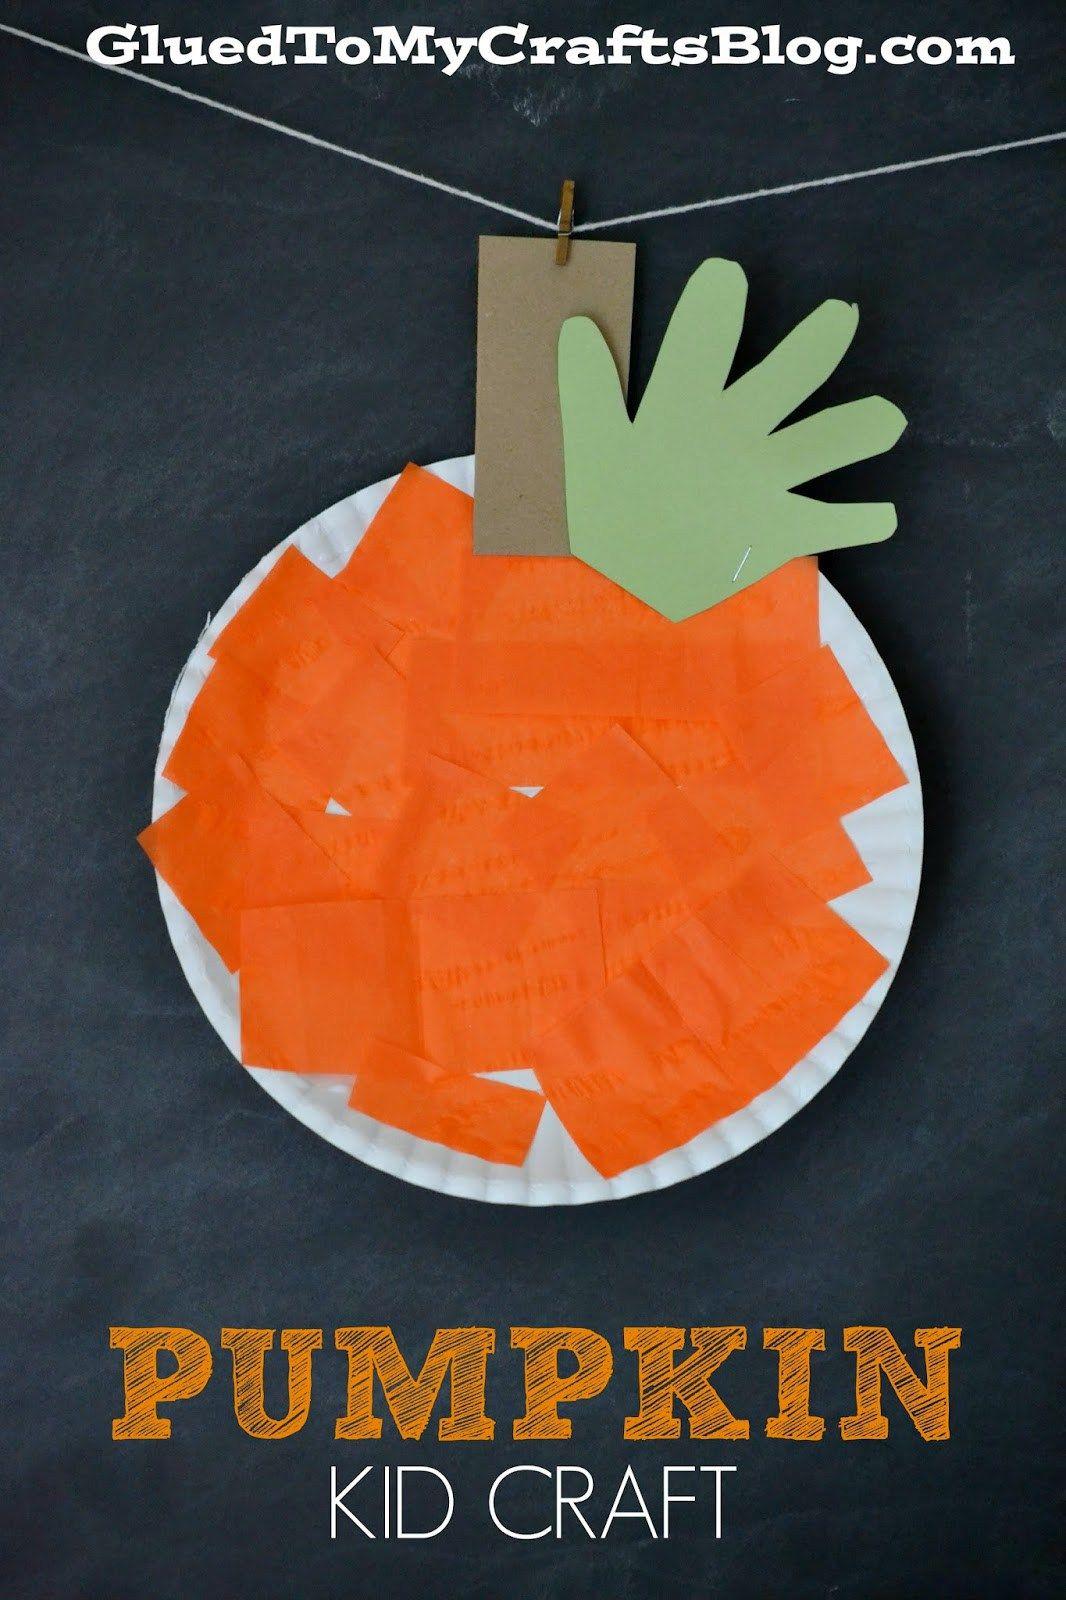 Paper Plate Pumpkin Kid Craft